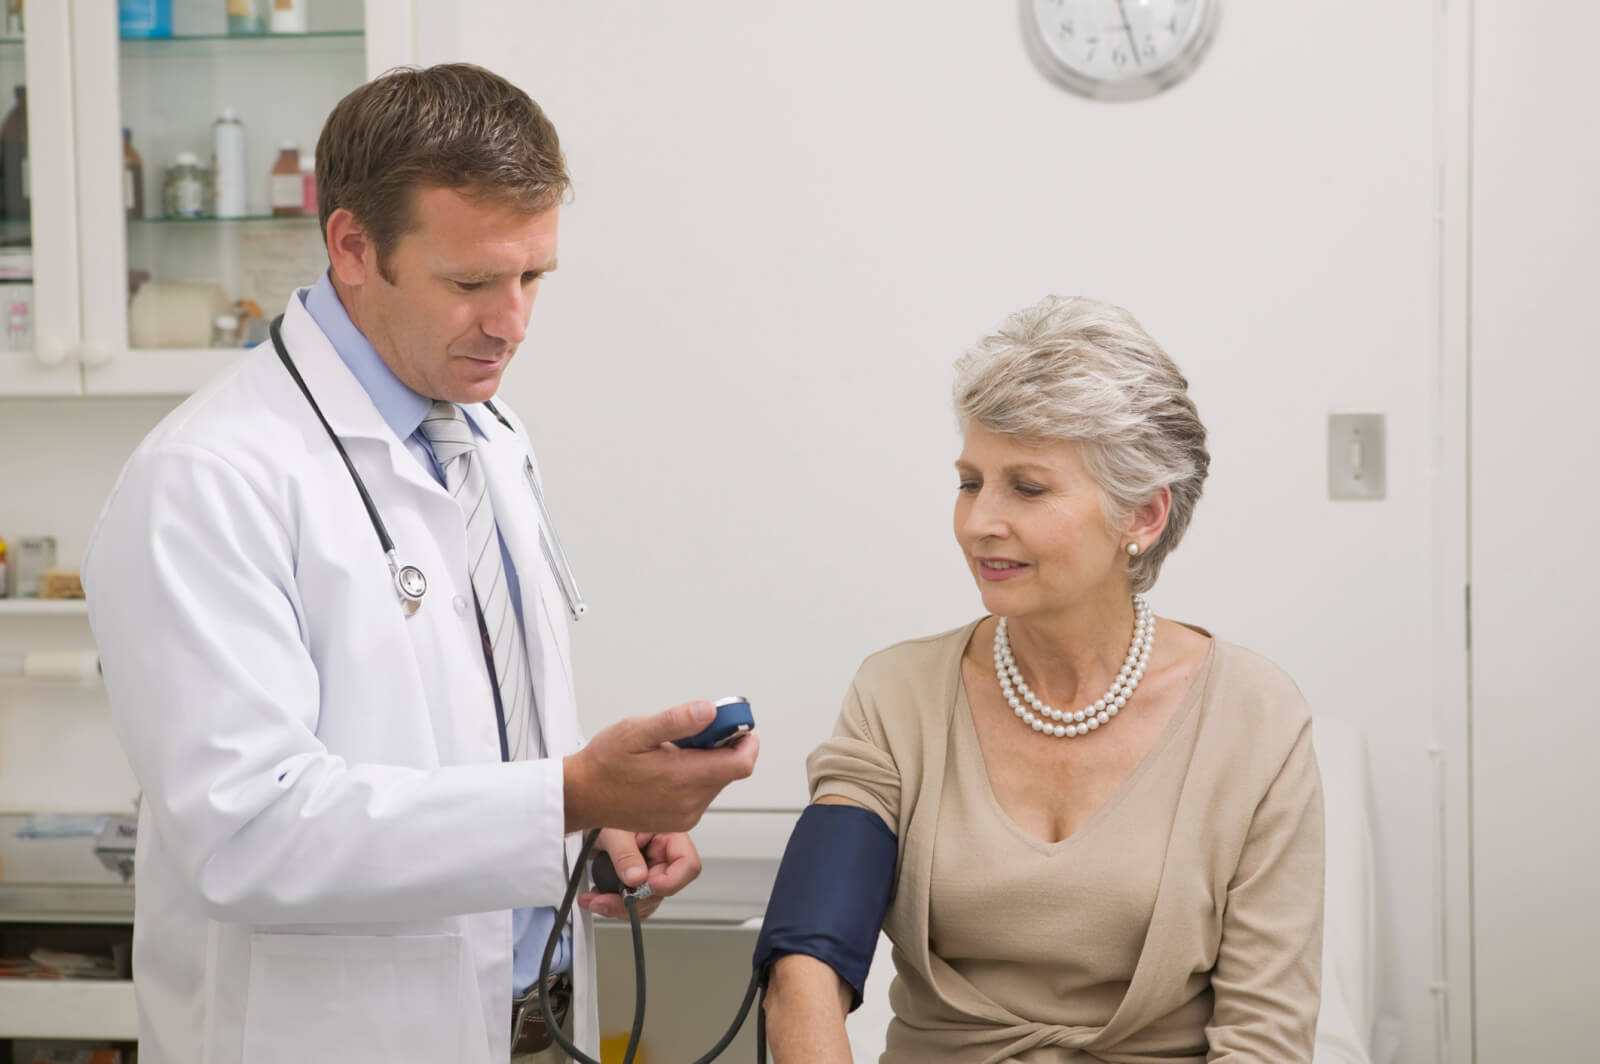 признаки сахарного диабета у женщин после 50